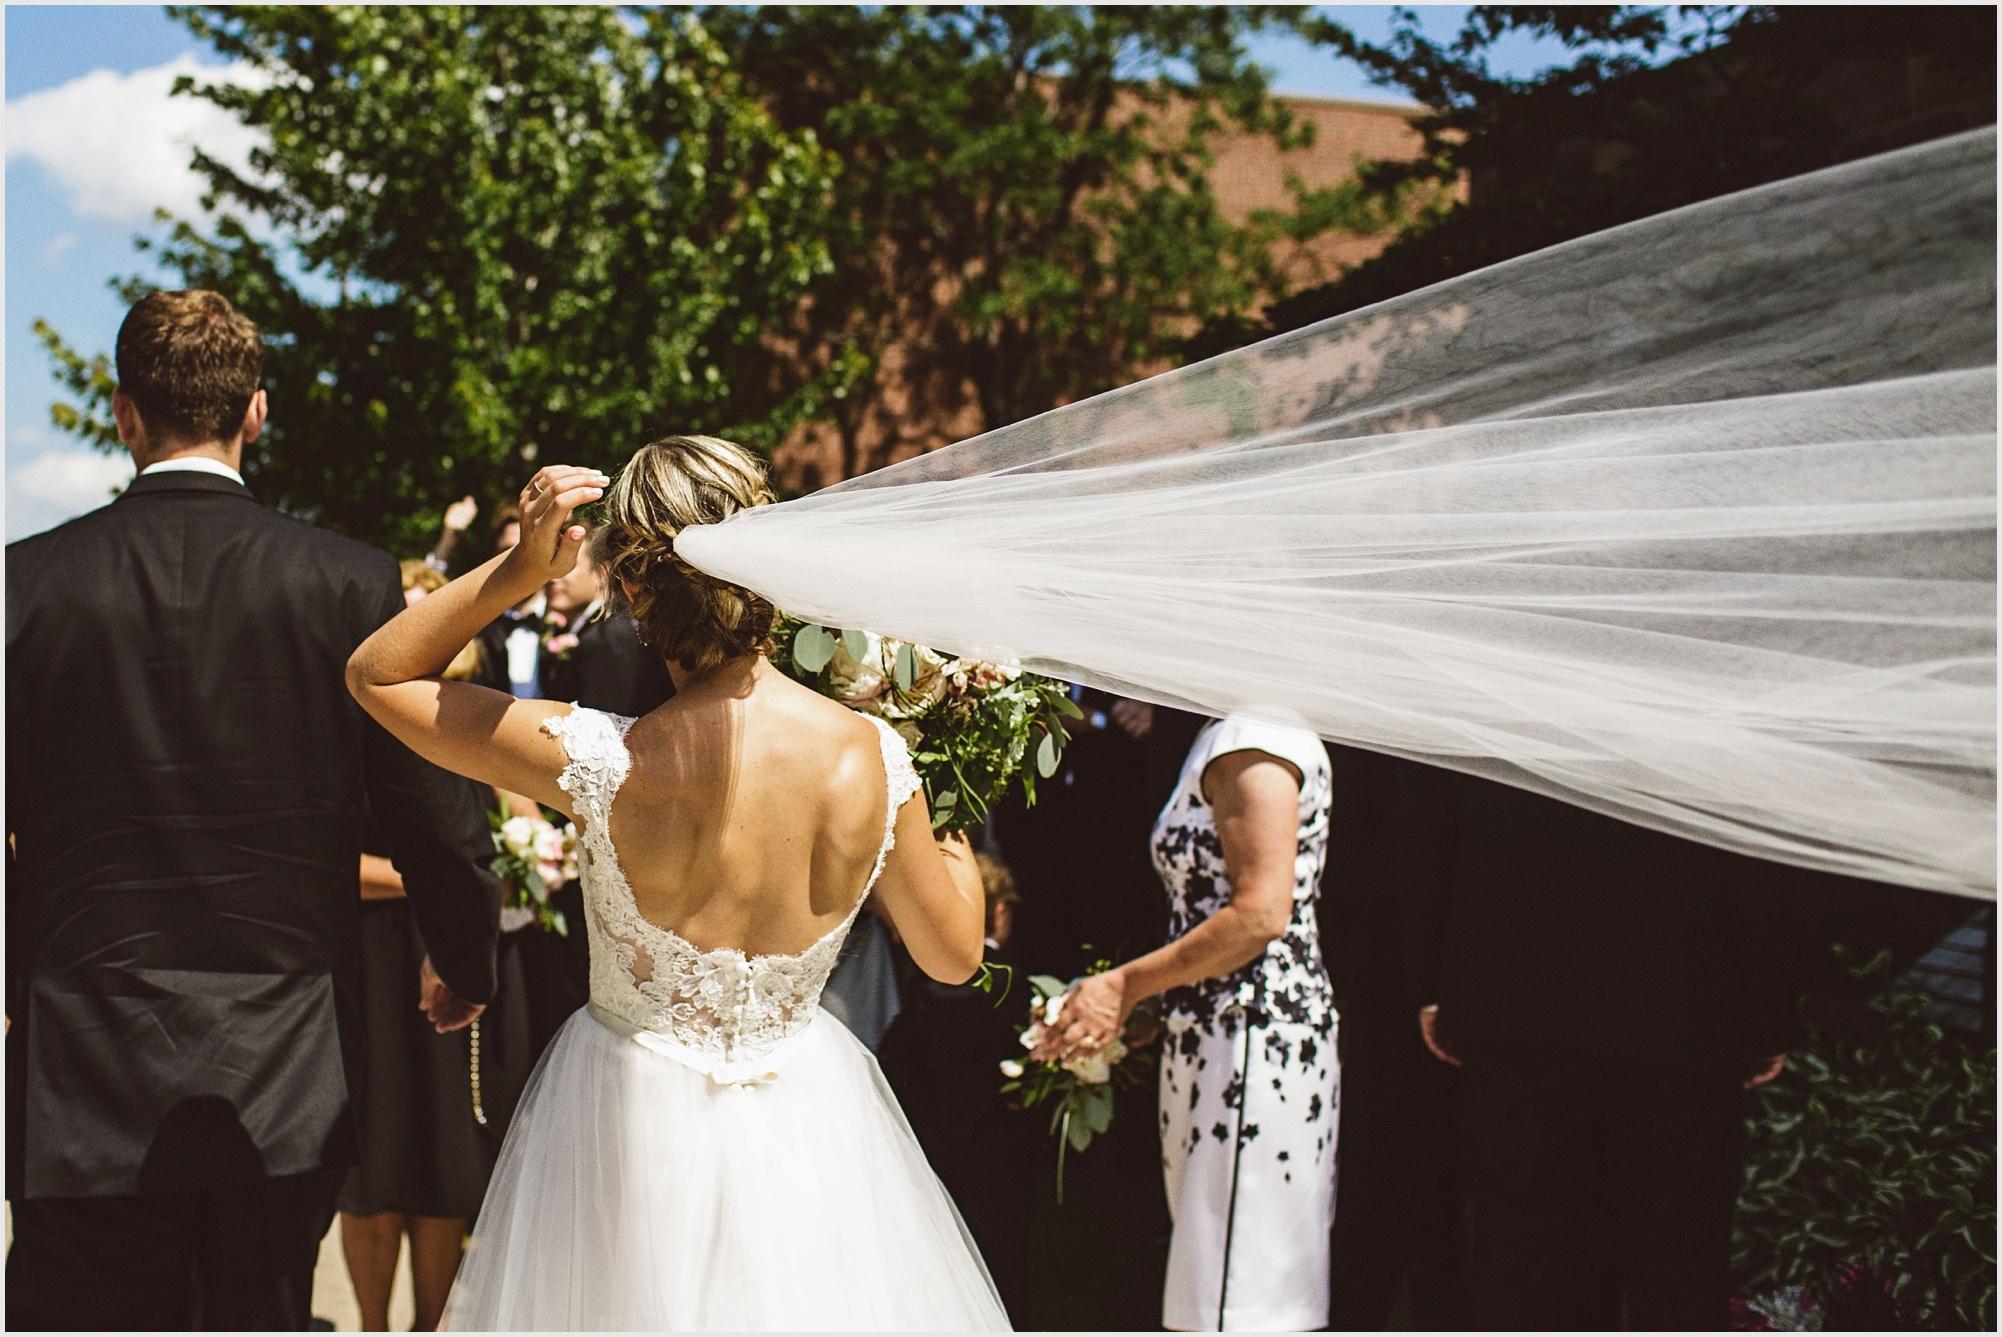 maura_david_james_j_hill_wedding_lucas_botz_photography_021.jpg